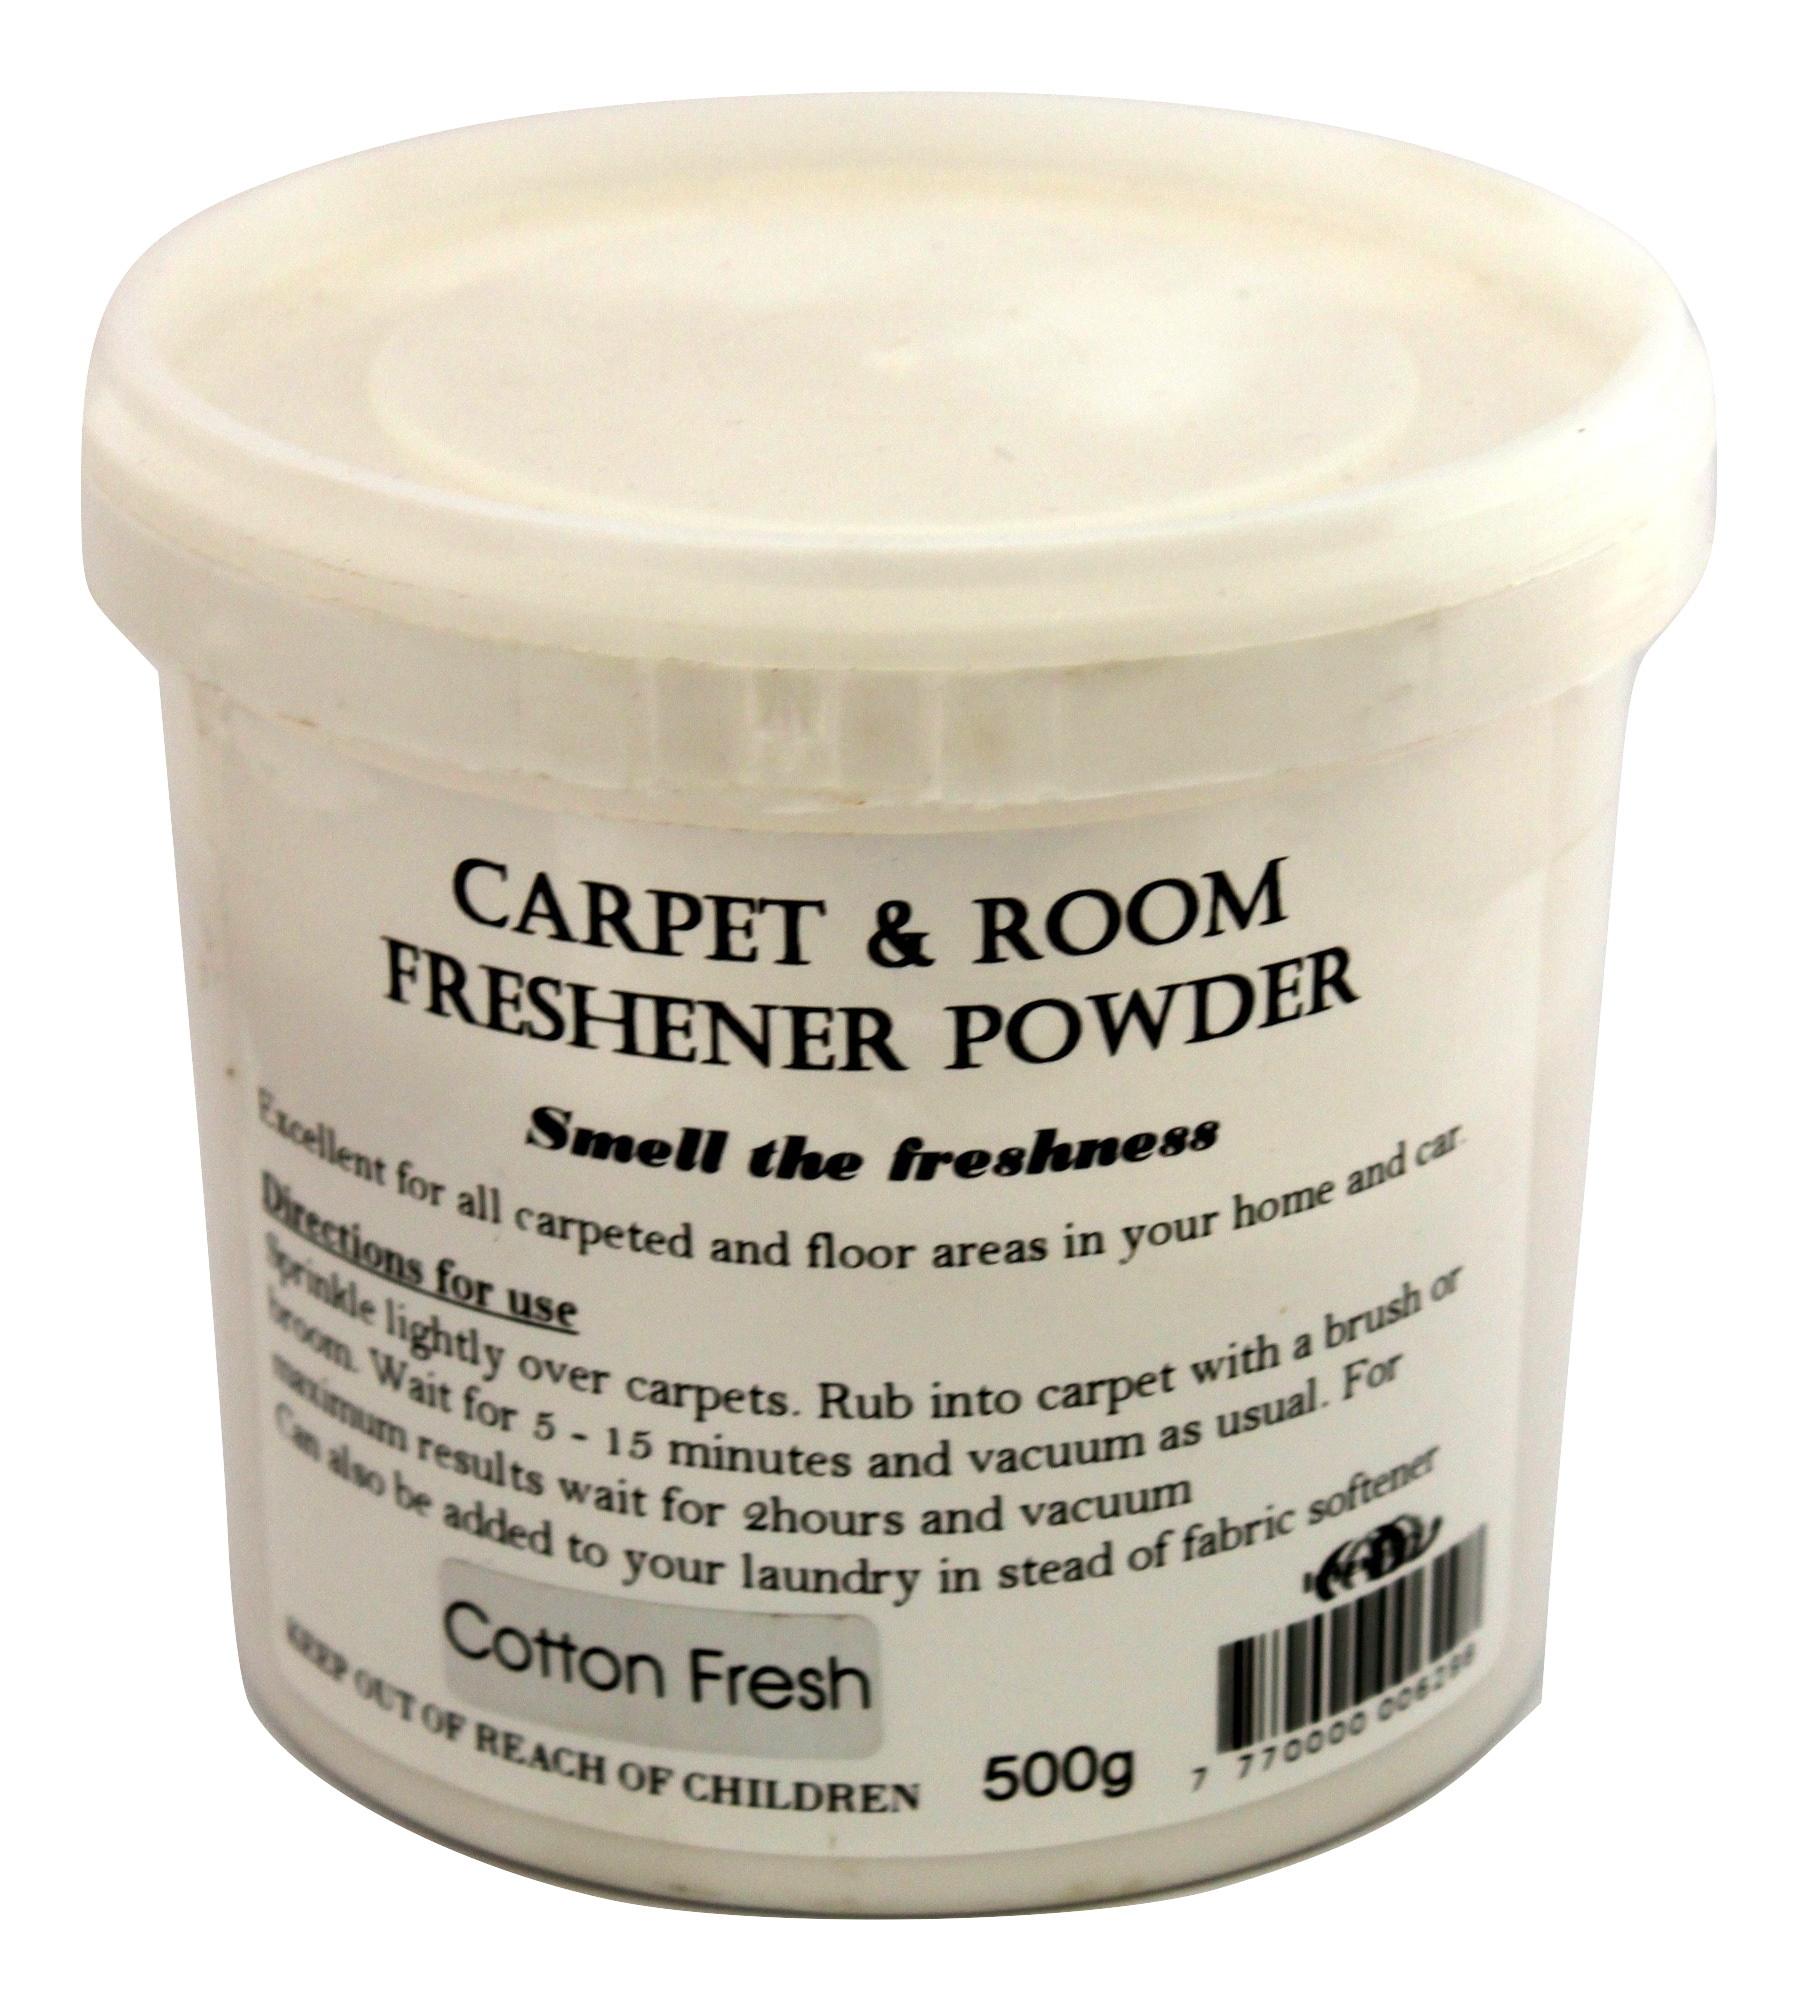 carpet-&amp-room-refresh-powder